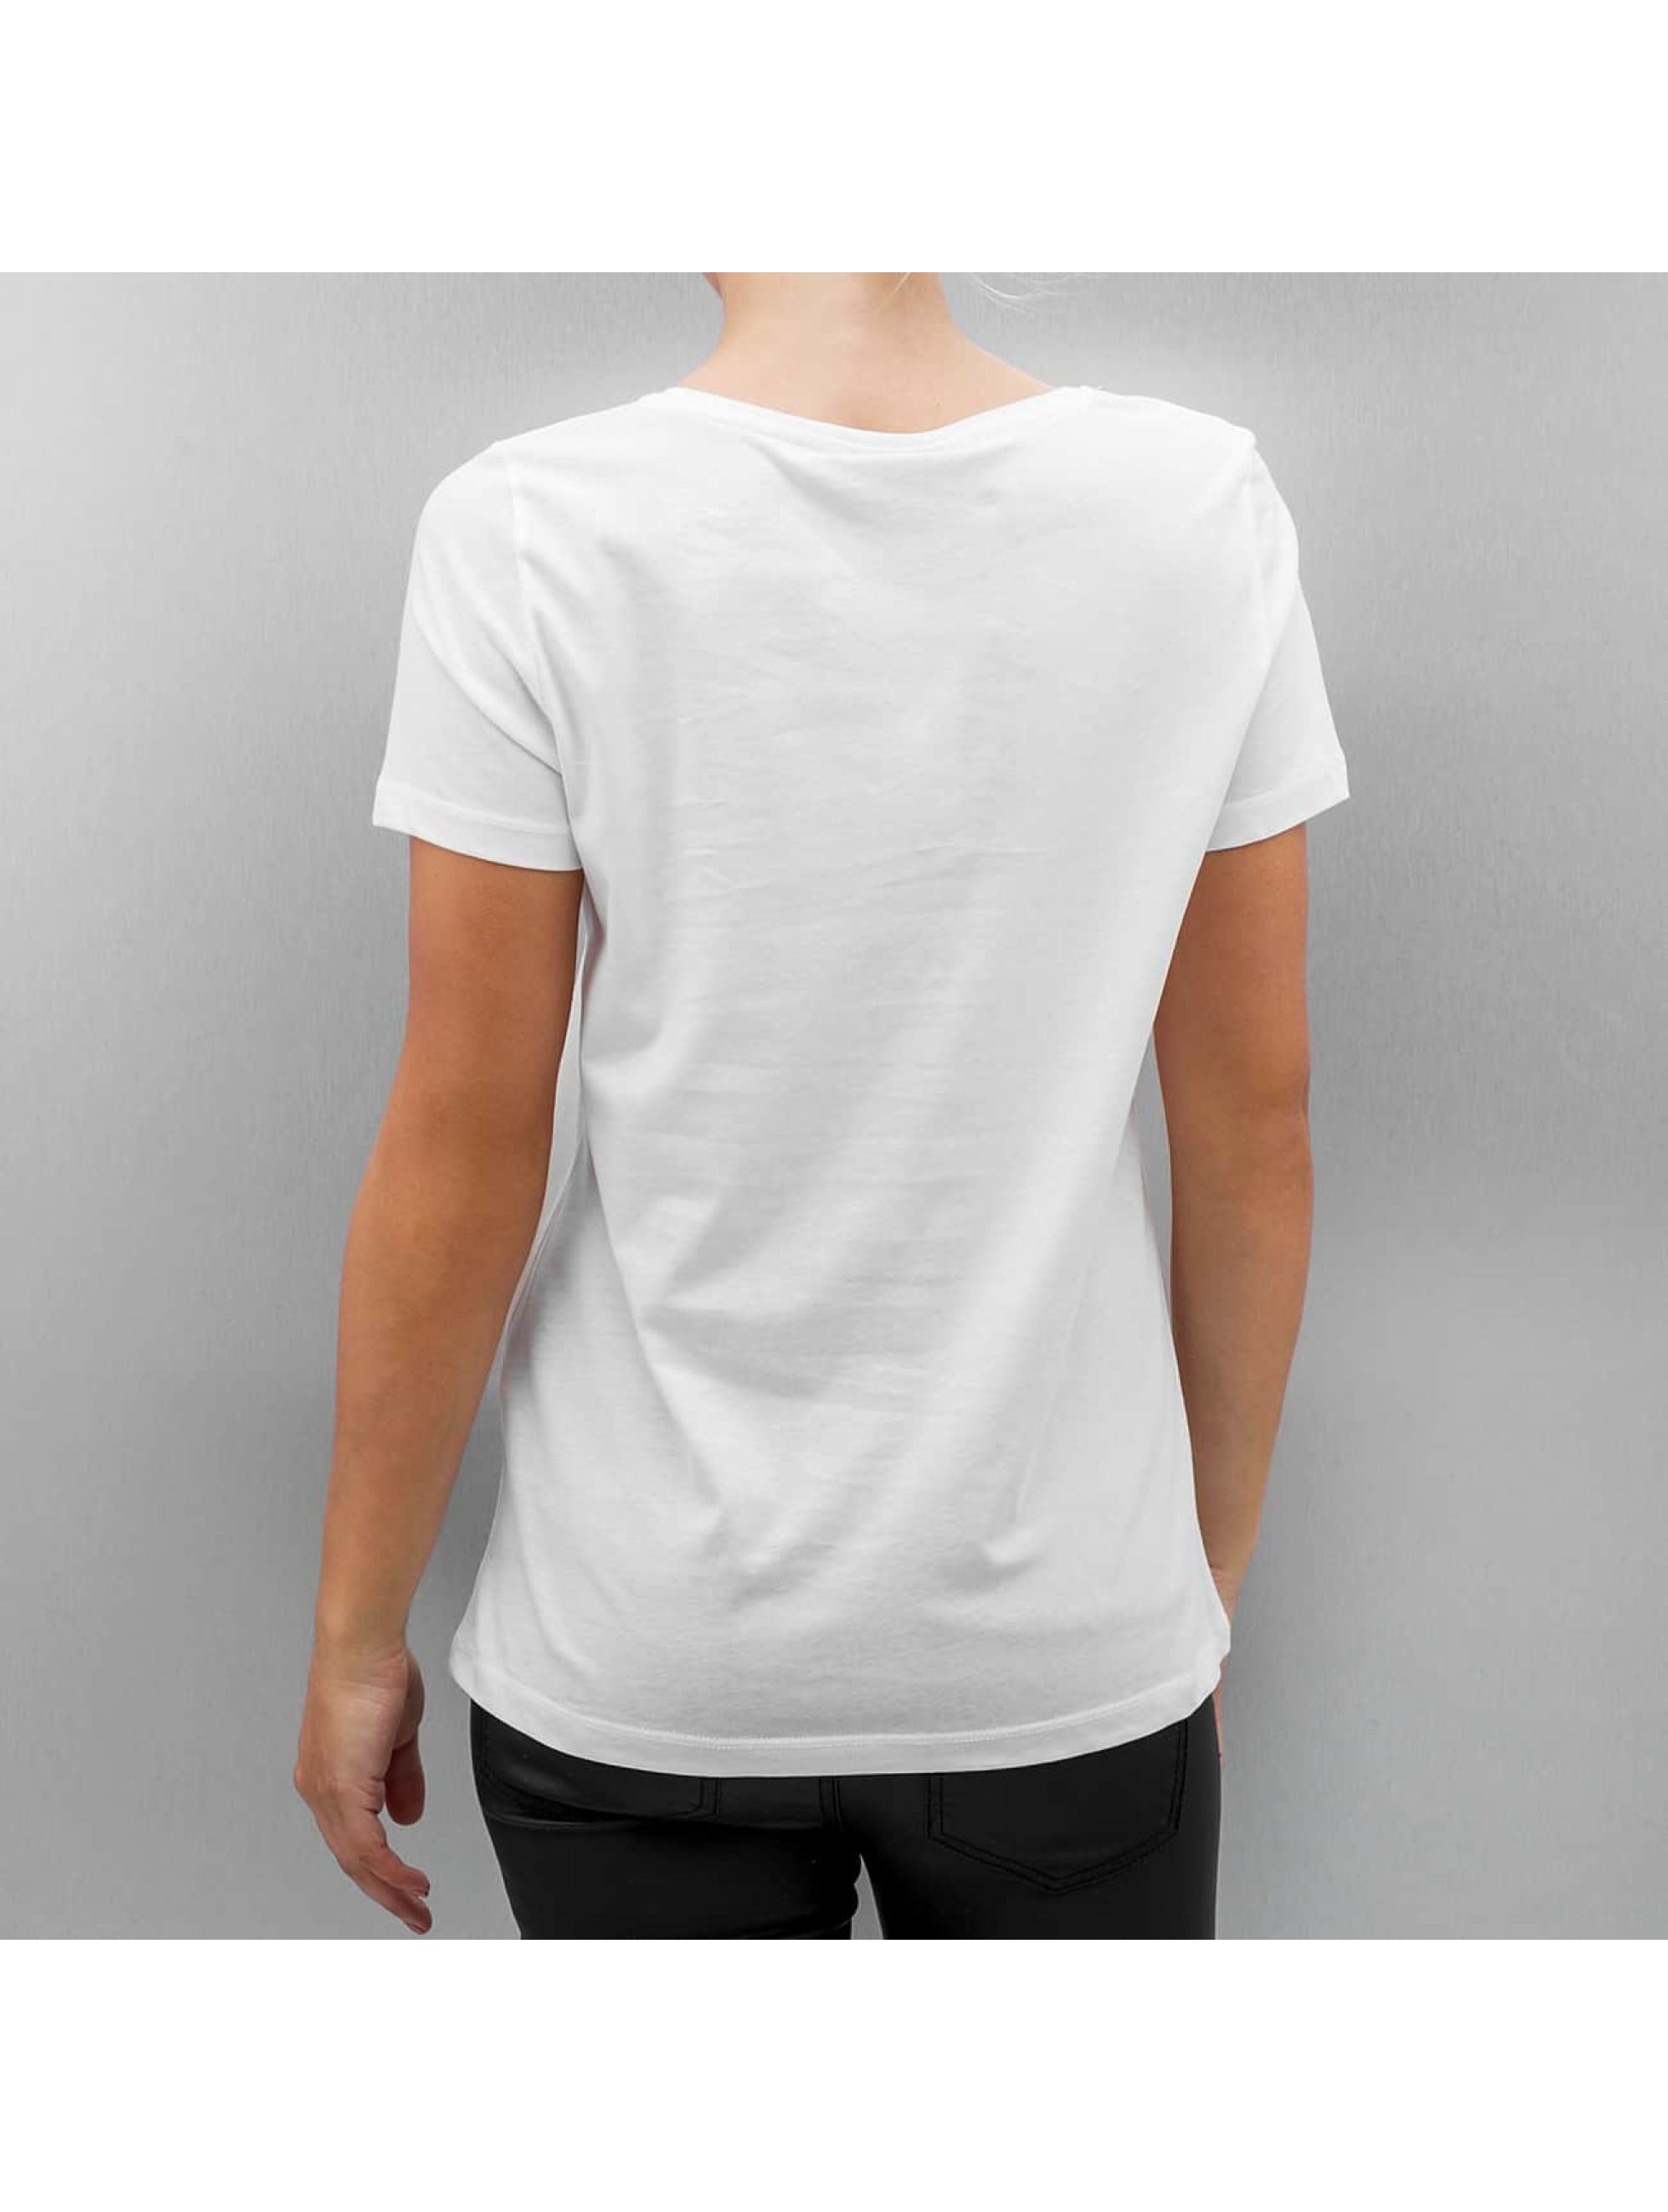 Vero Moda T-Shirt VmMy blanc